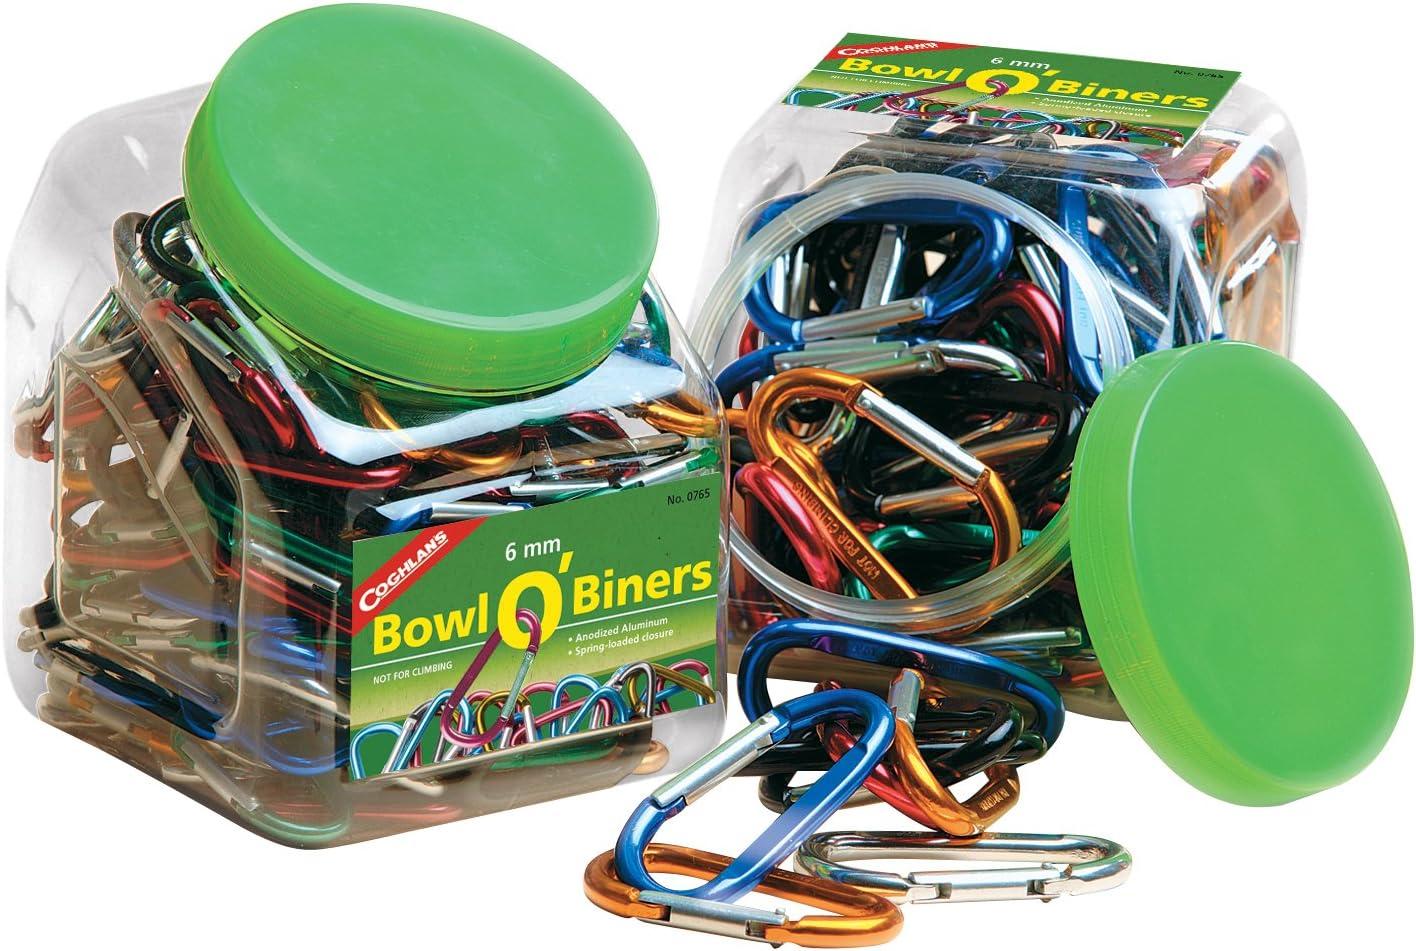 Coghlans 6mm Bowl OBiners Bulk Pack, 174 Biners